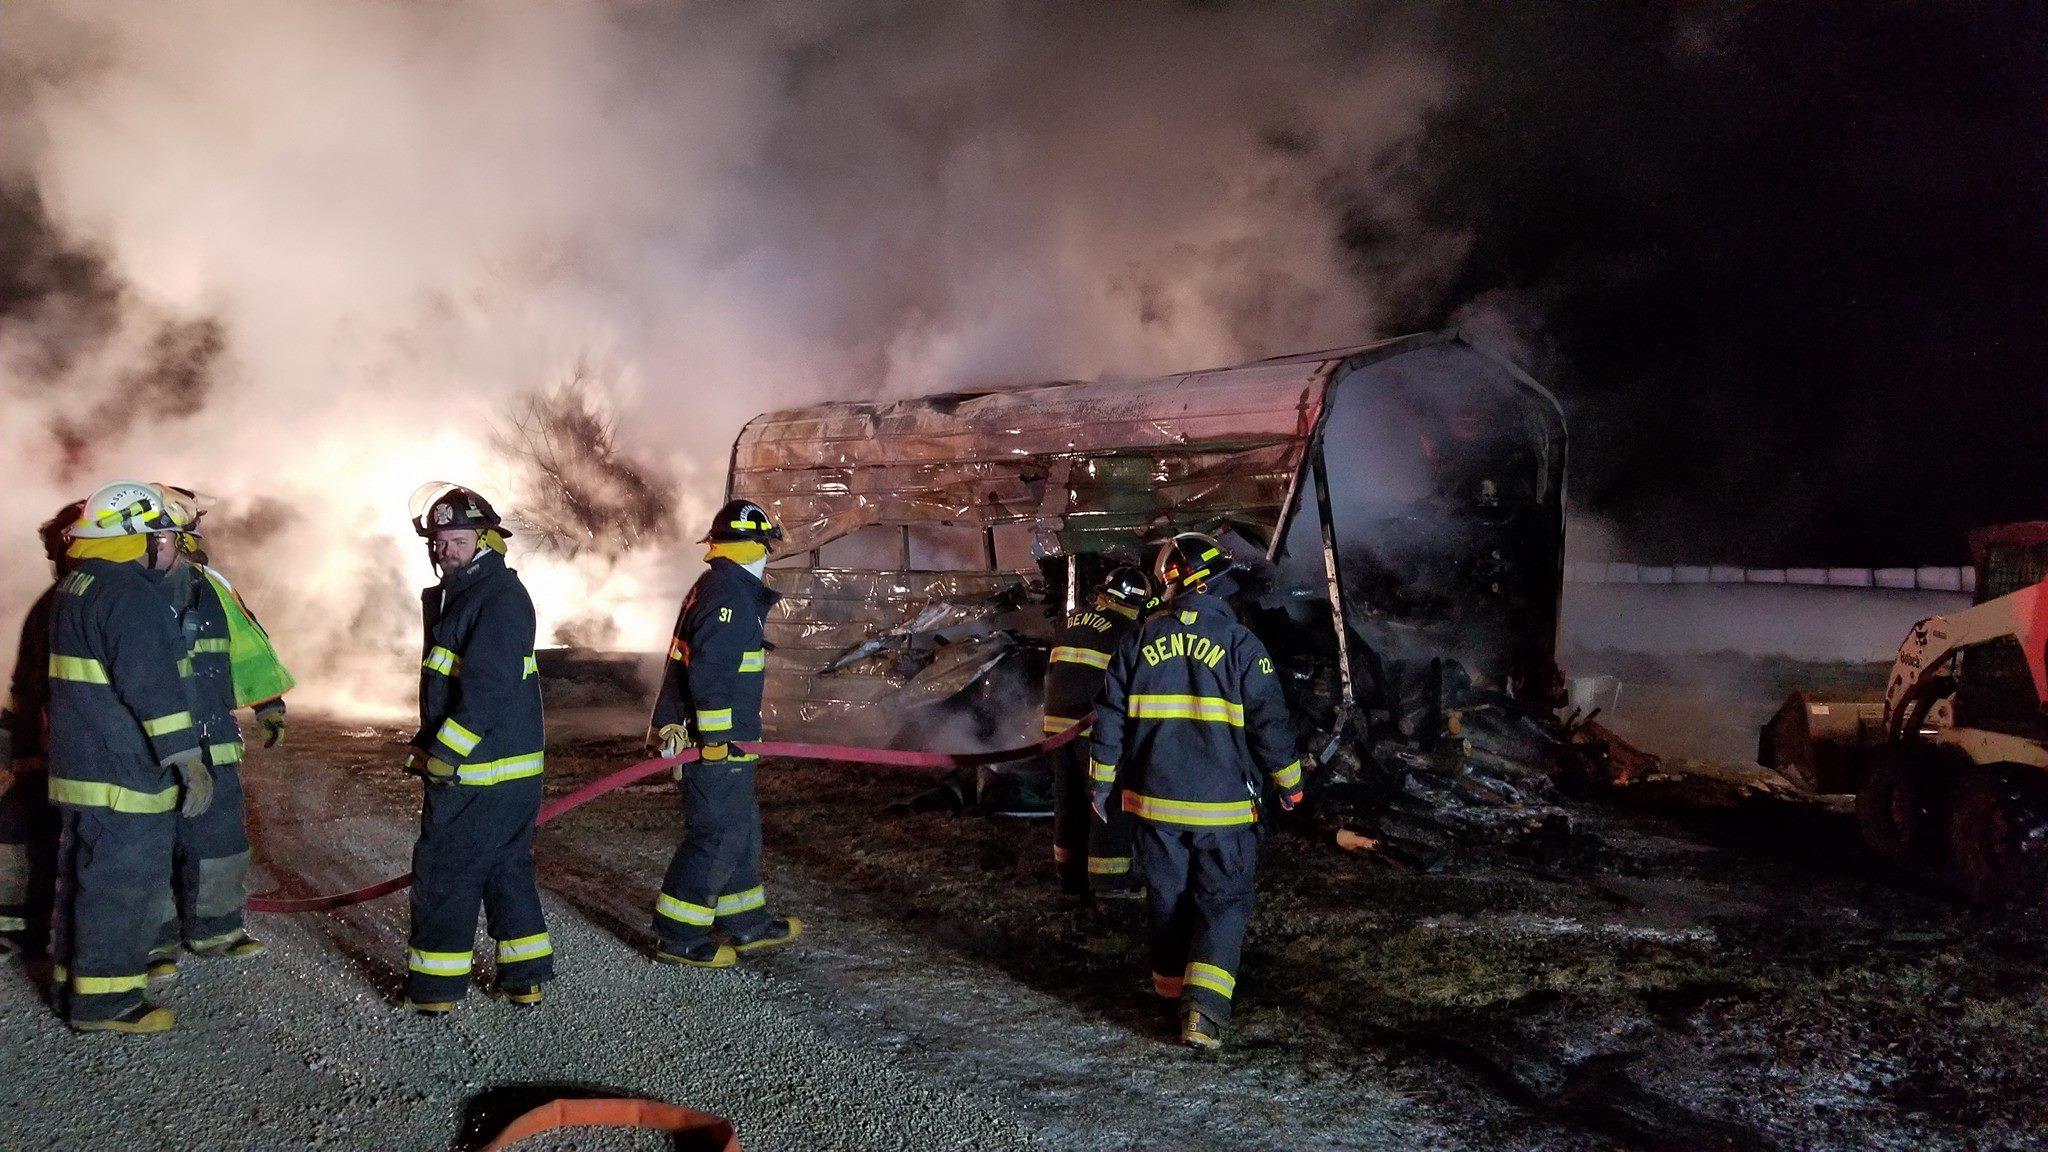 Benton Fire Department photo